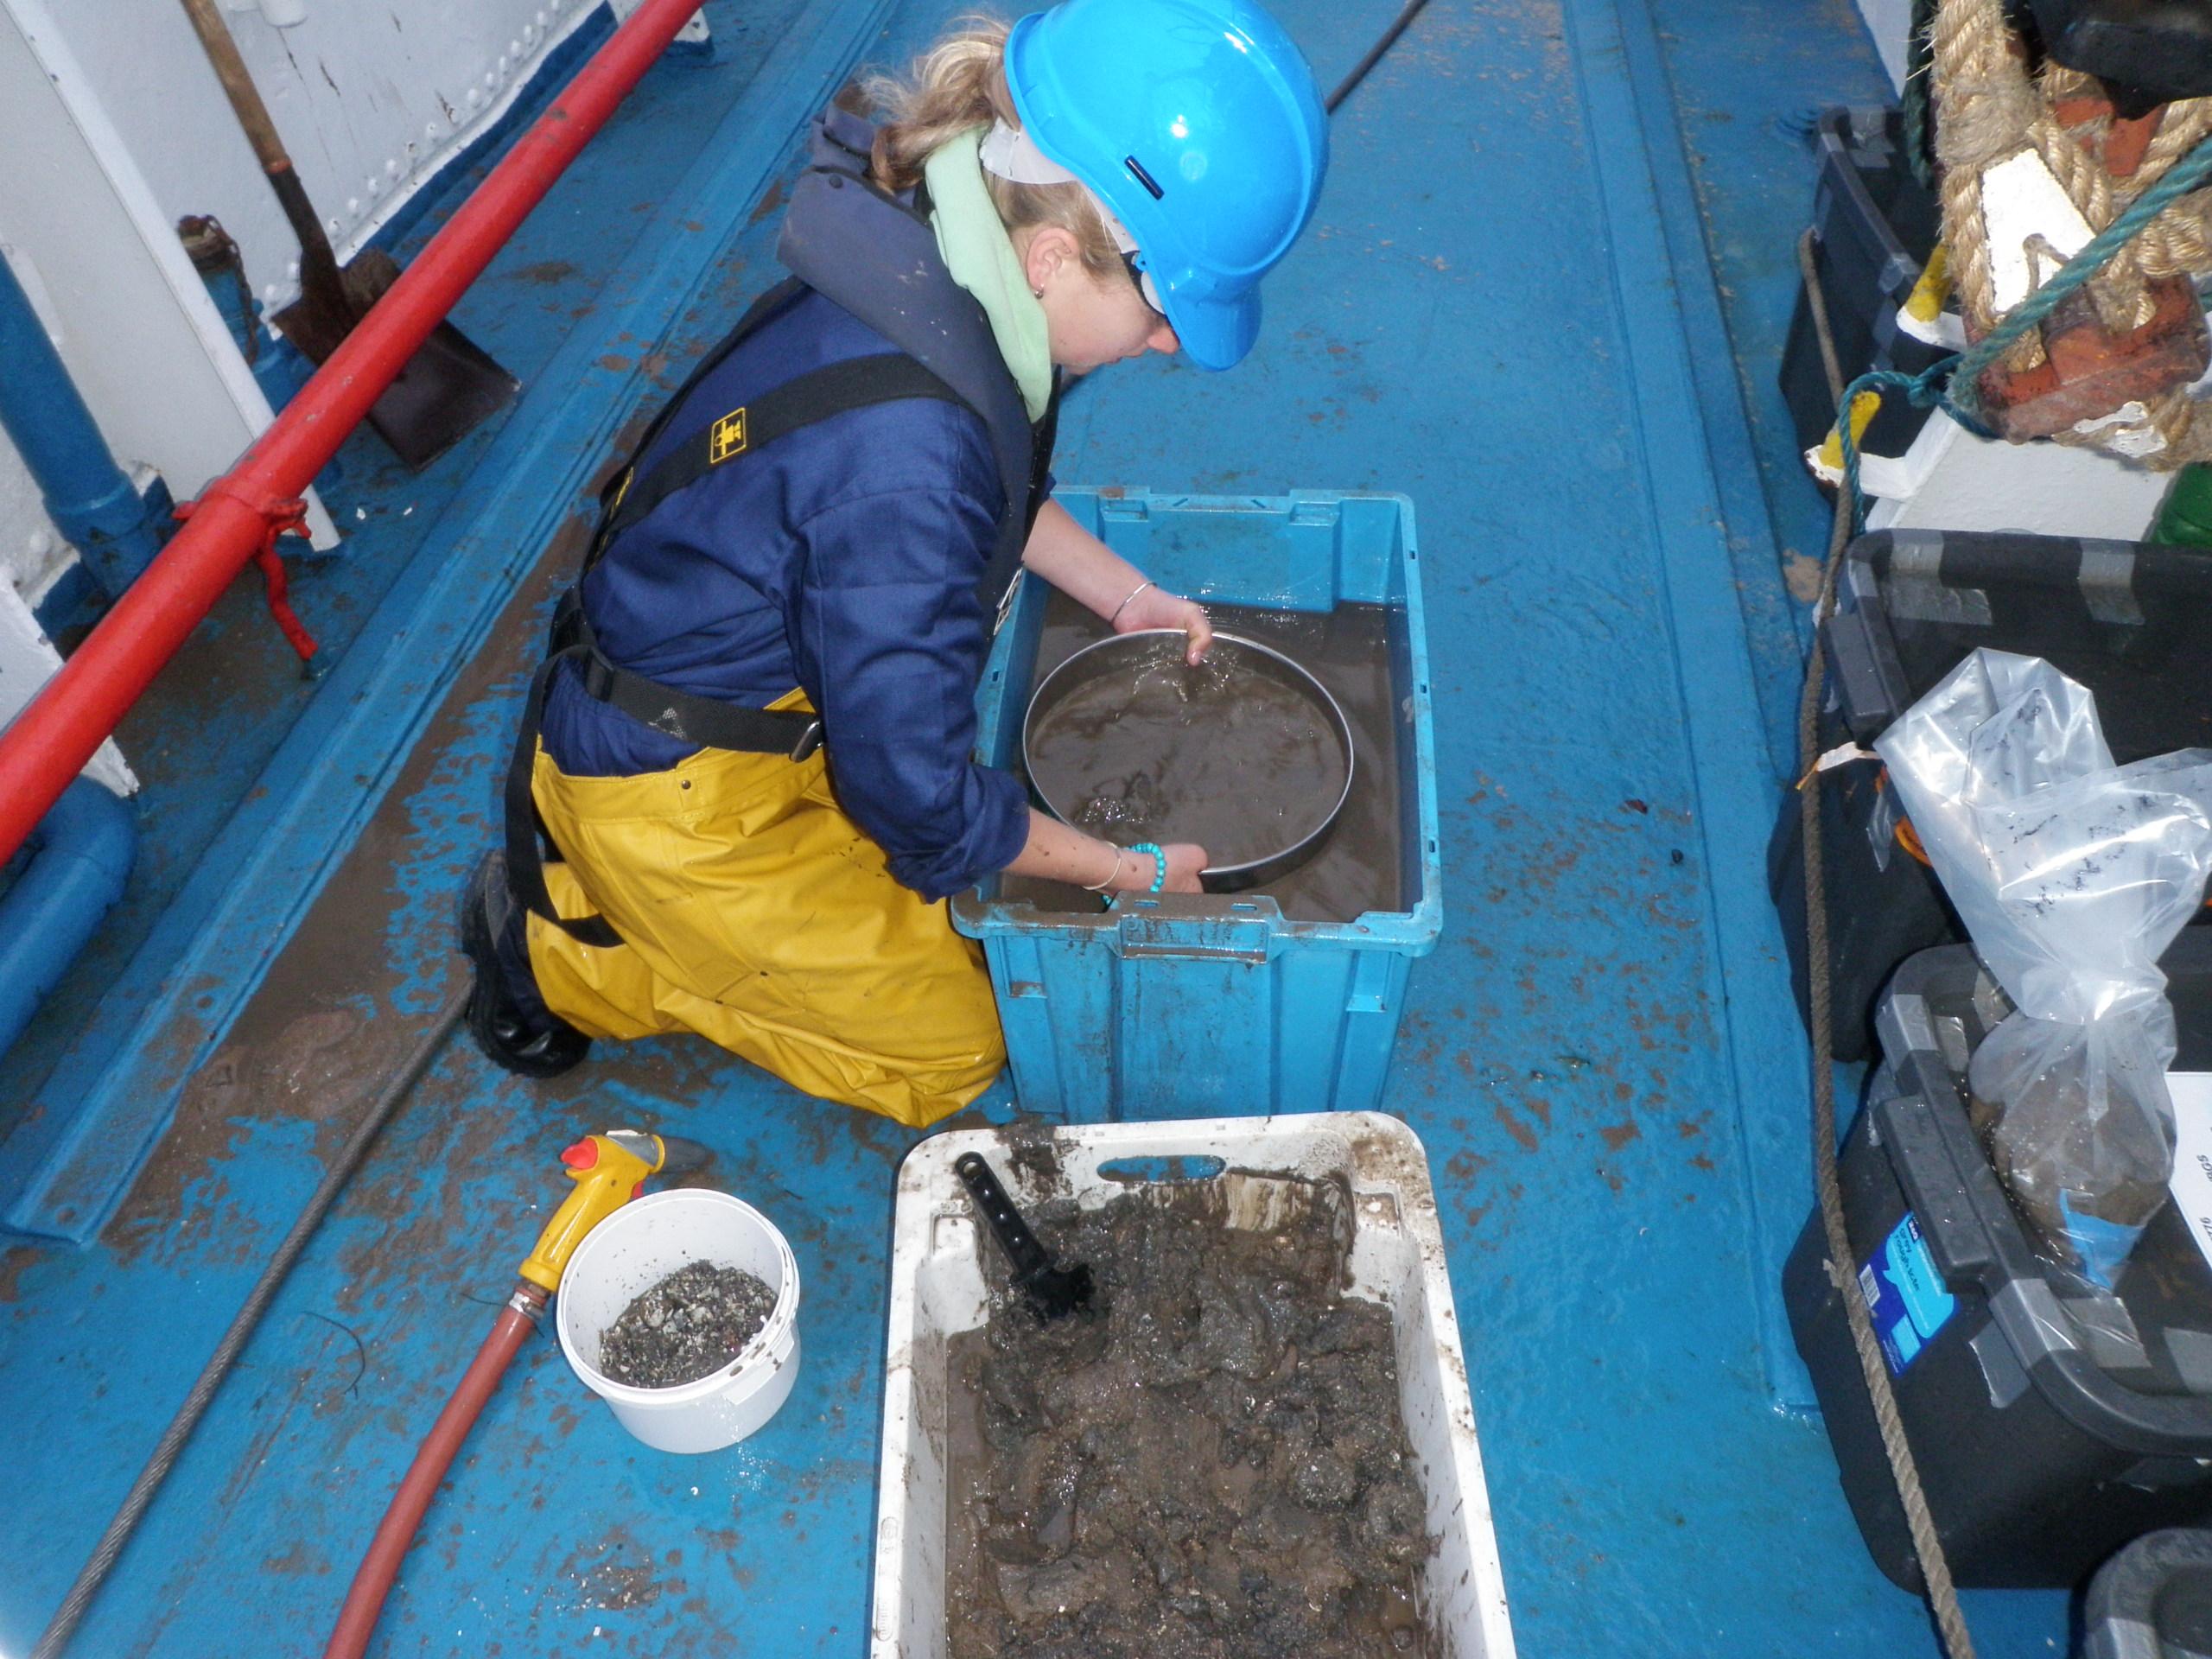 On the boat: sorting Hamon Grab samples